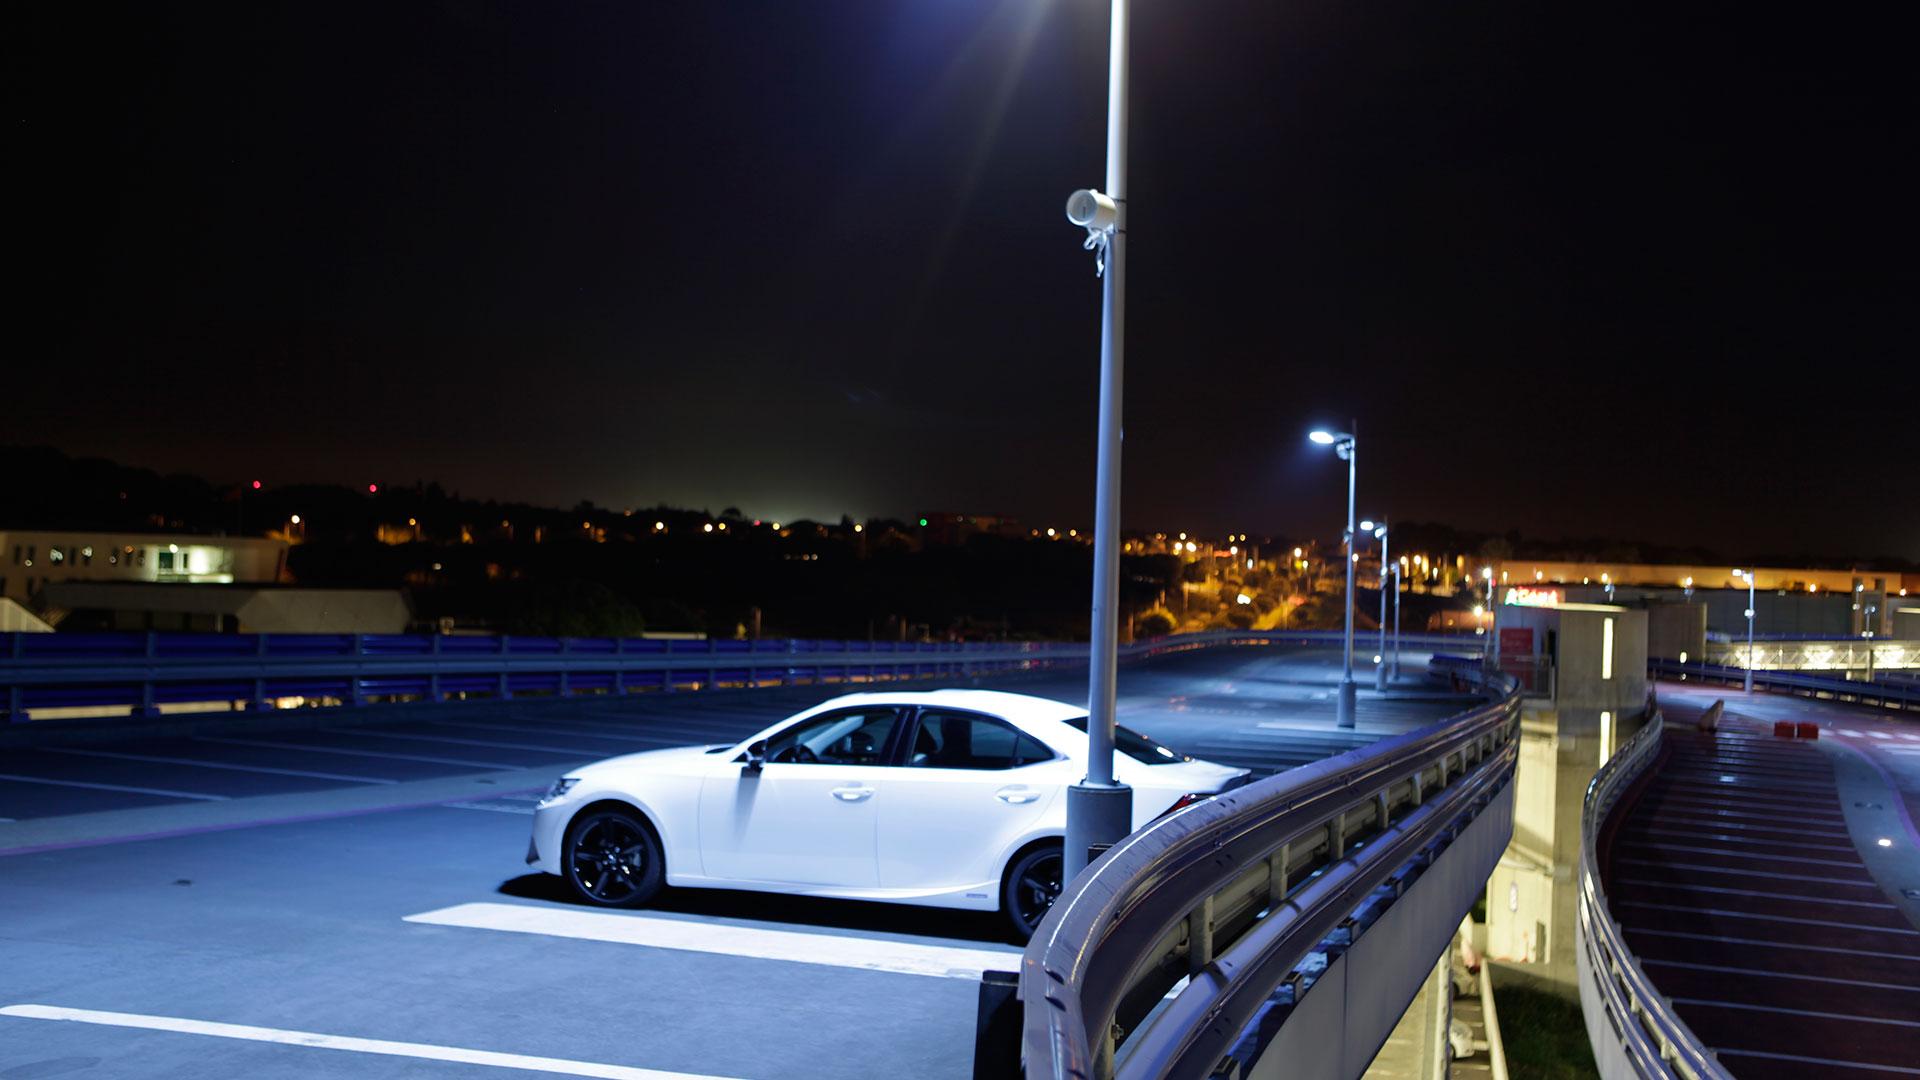 Nuevo Spot Lexus IS 300h Híbrido hero asset